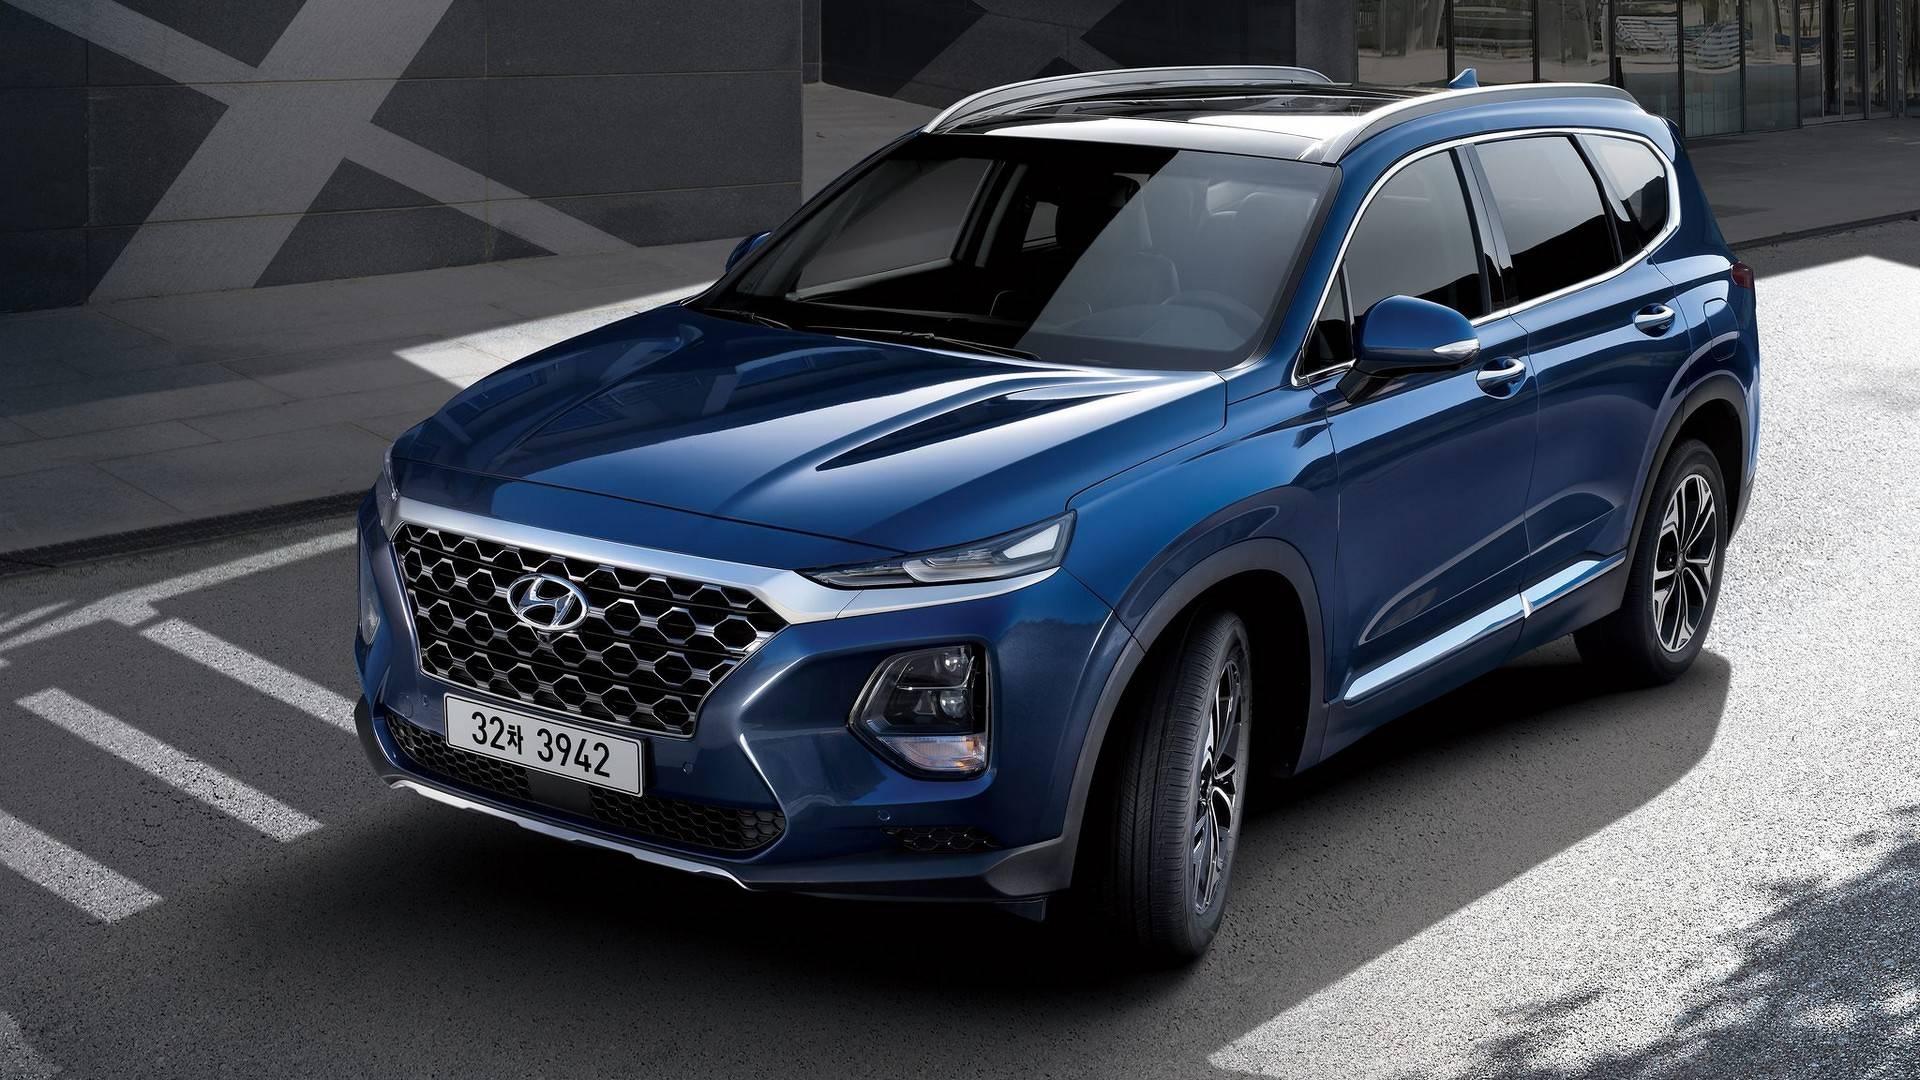 Elantra Interior 2017 >> 2019 Hyundai Santa Fe Looks Magnificent In New Official Photos And Videos - autoevolution